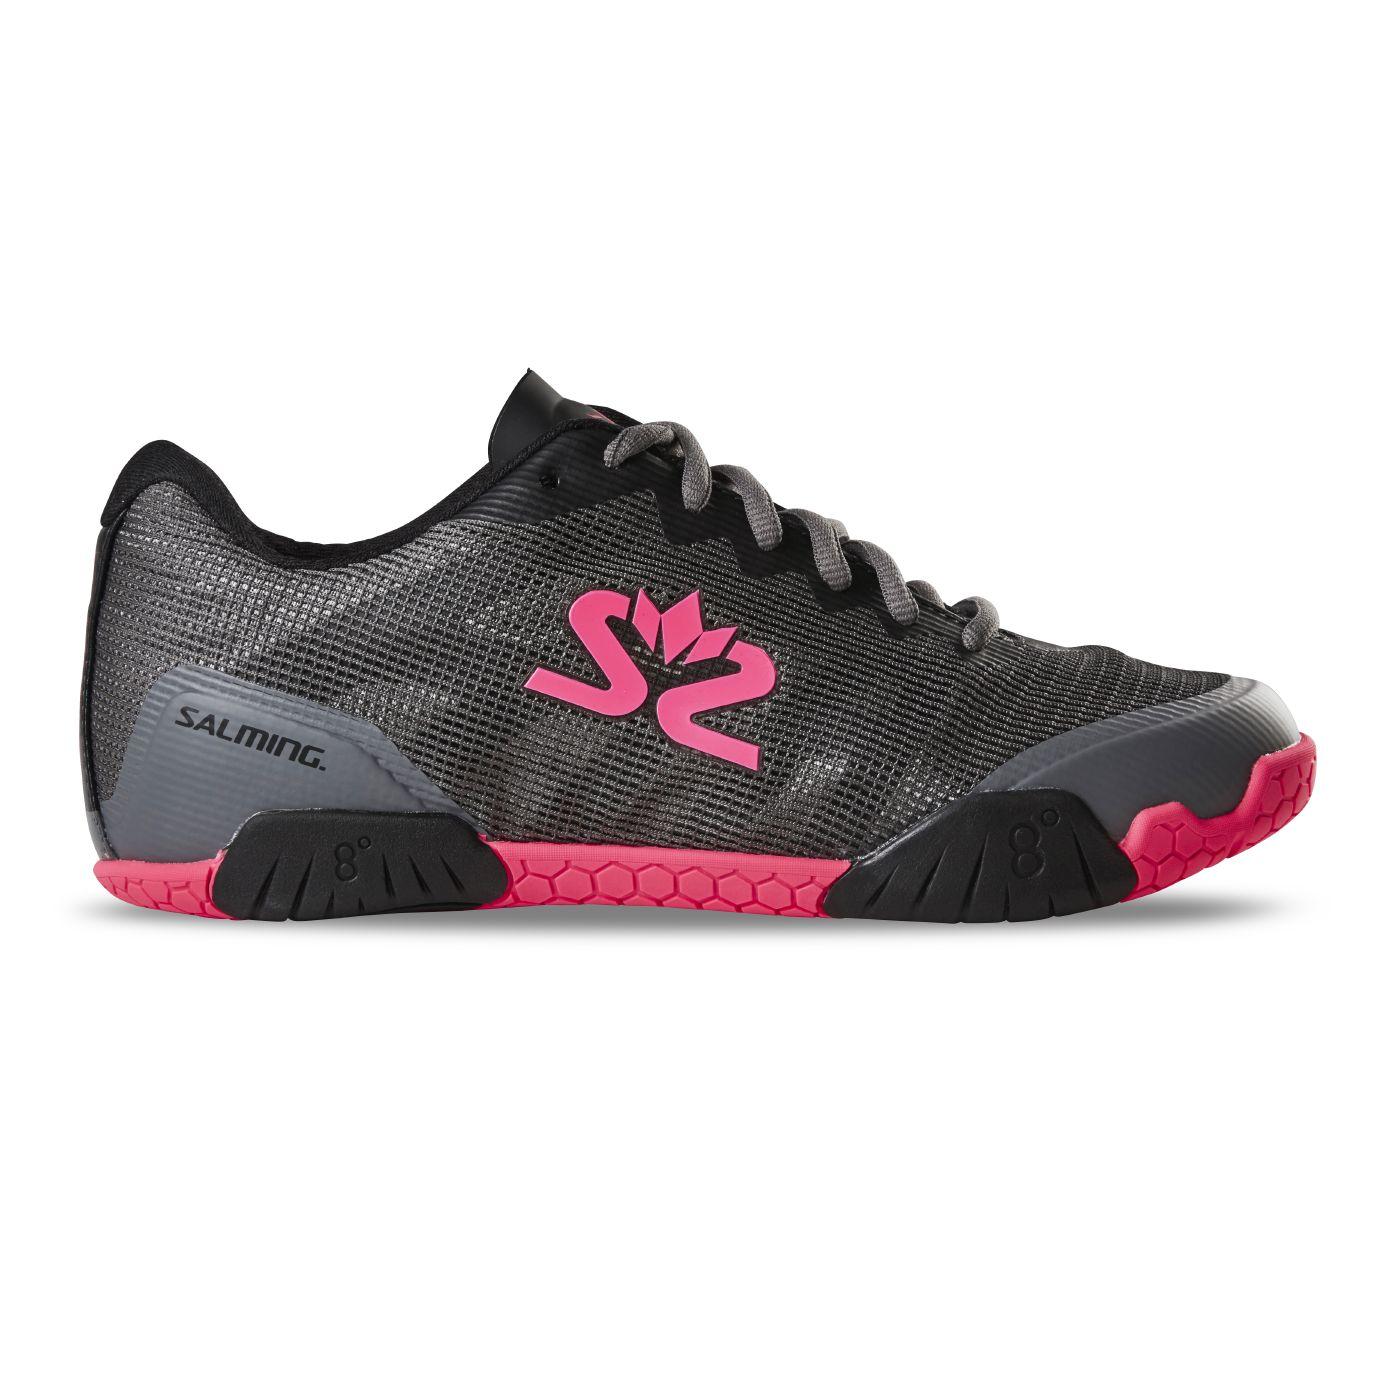 Salming Hawk Shoe Women GunMetal/Pink 8,5 UK - 42 2/3 EUR - 27,5 cm